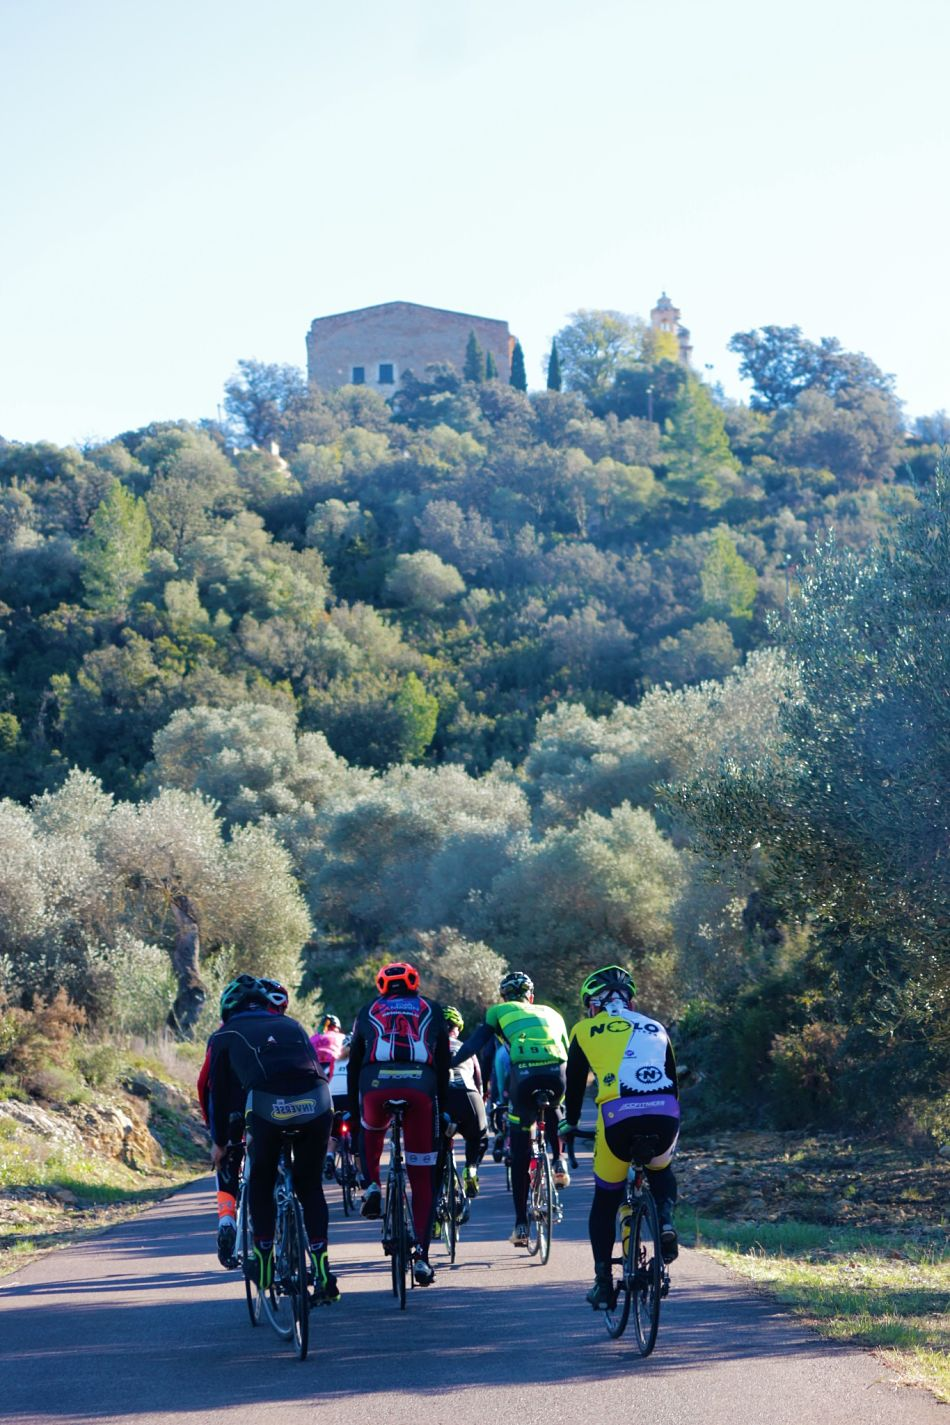 viajes_bici_maestrat_stage_feria_romana_ermitaangels